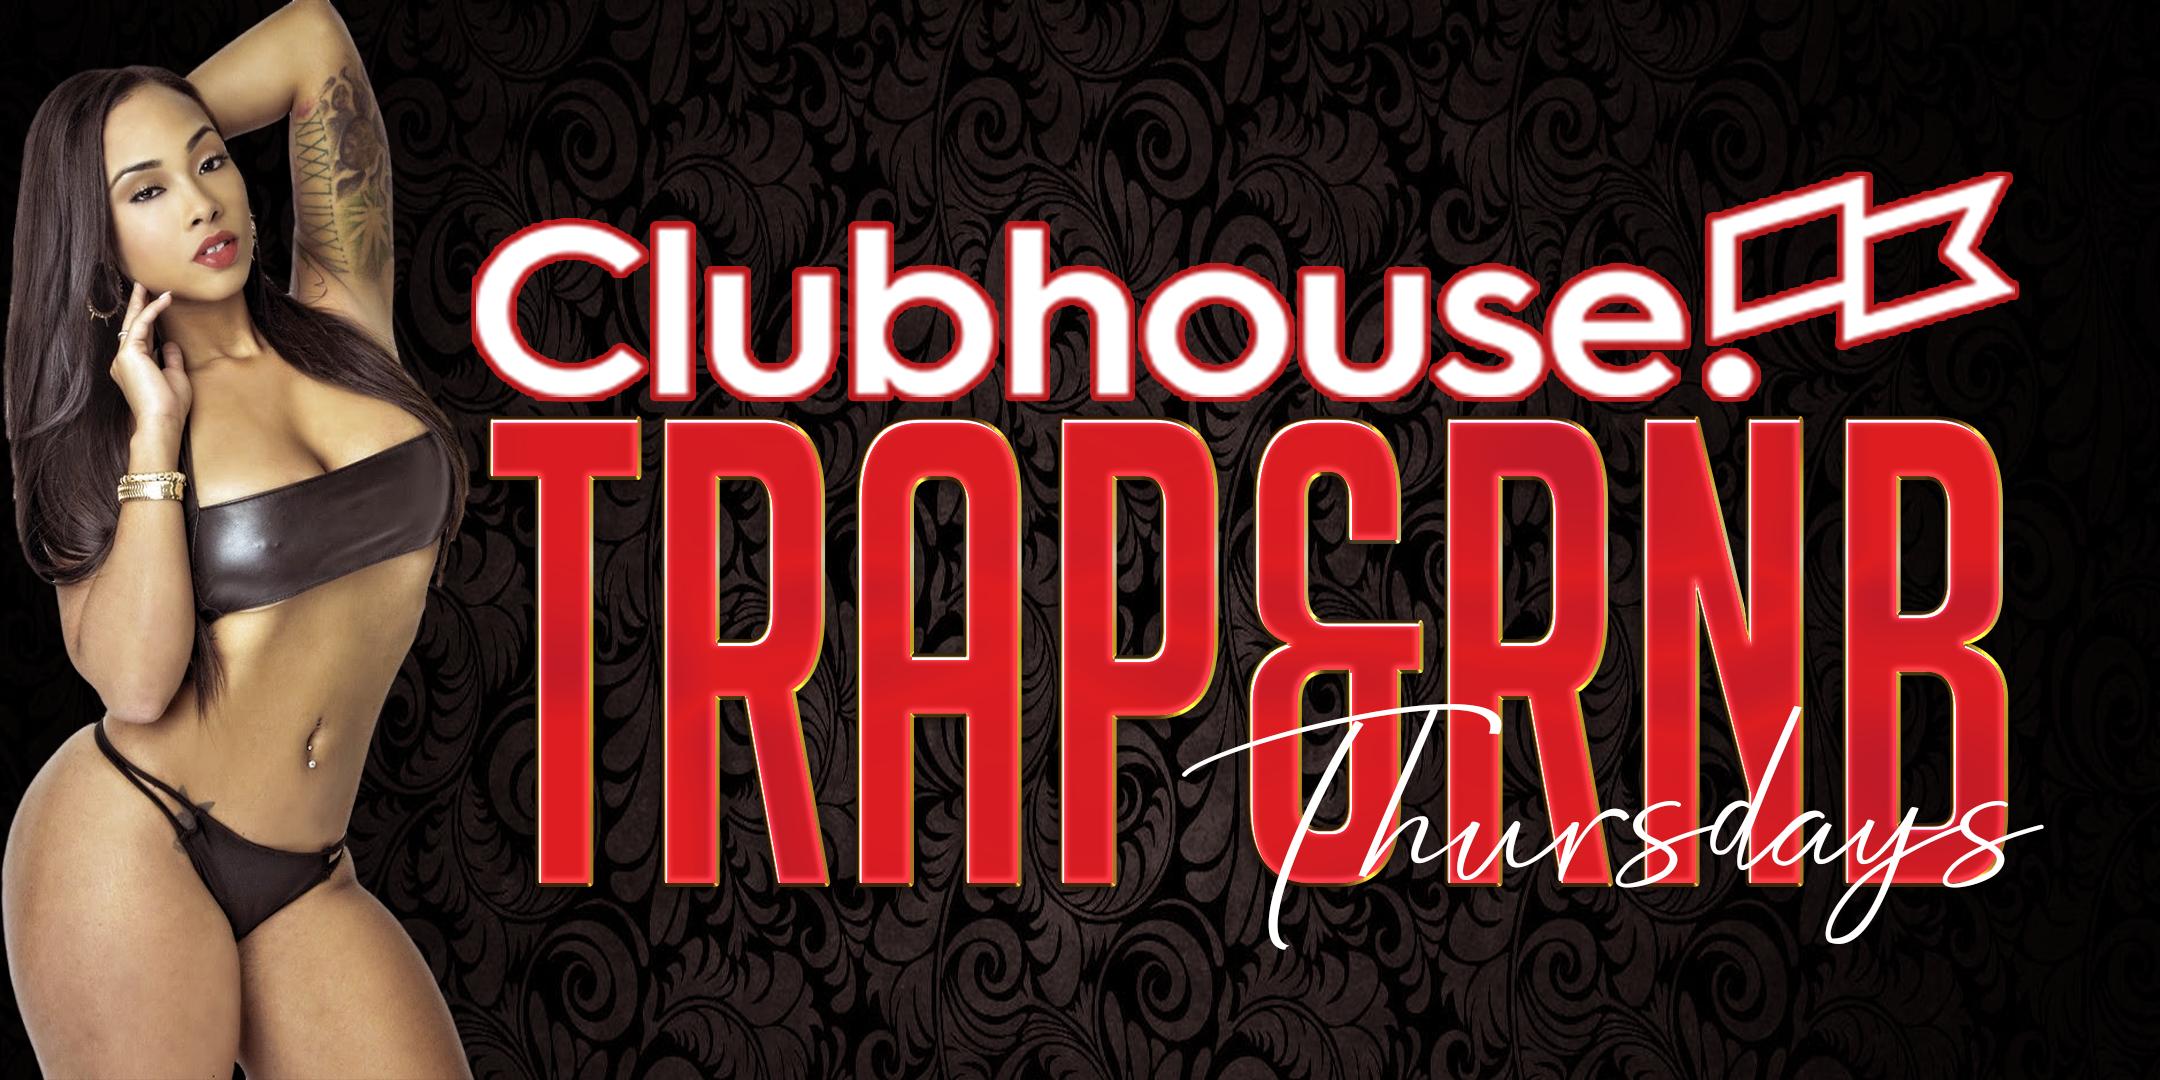 Clubhouse Trap & RnB Thurdays